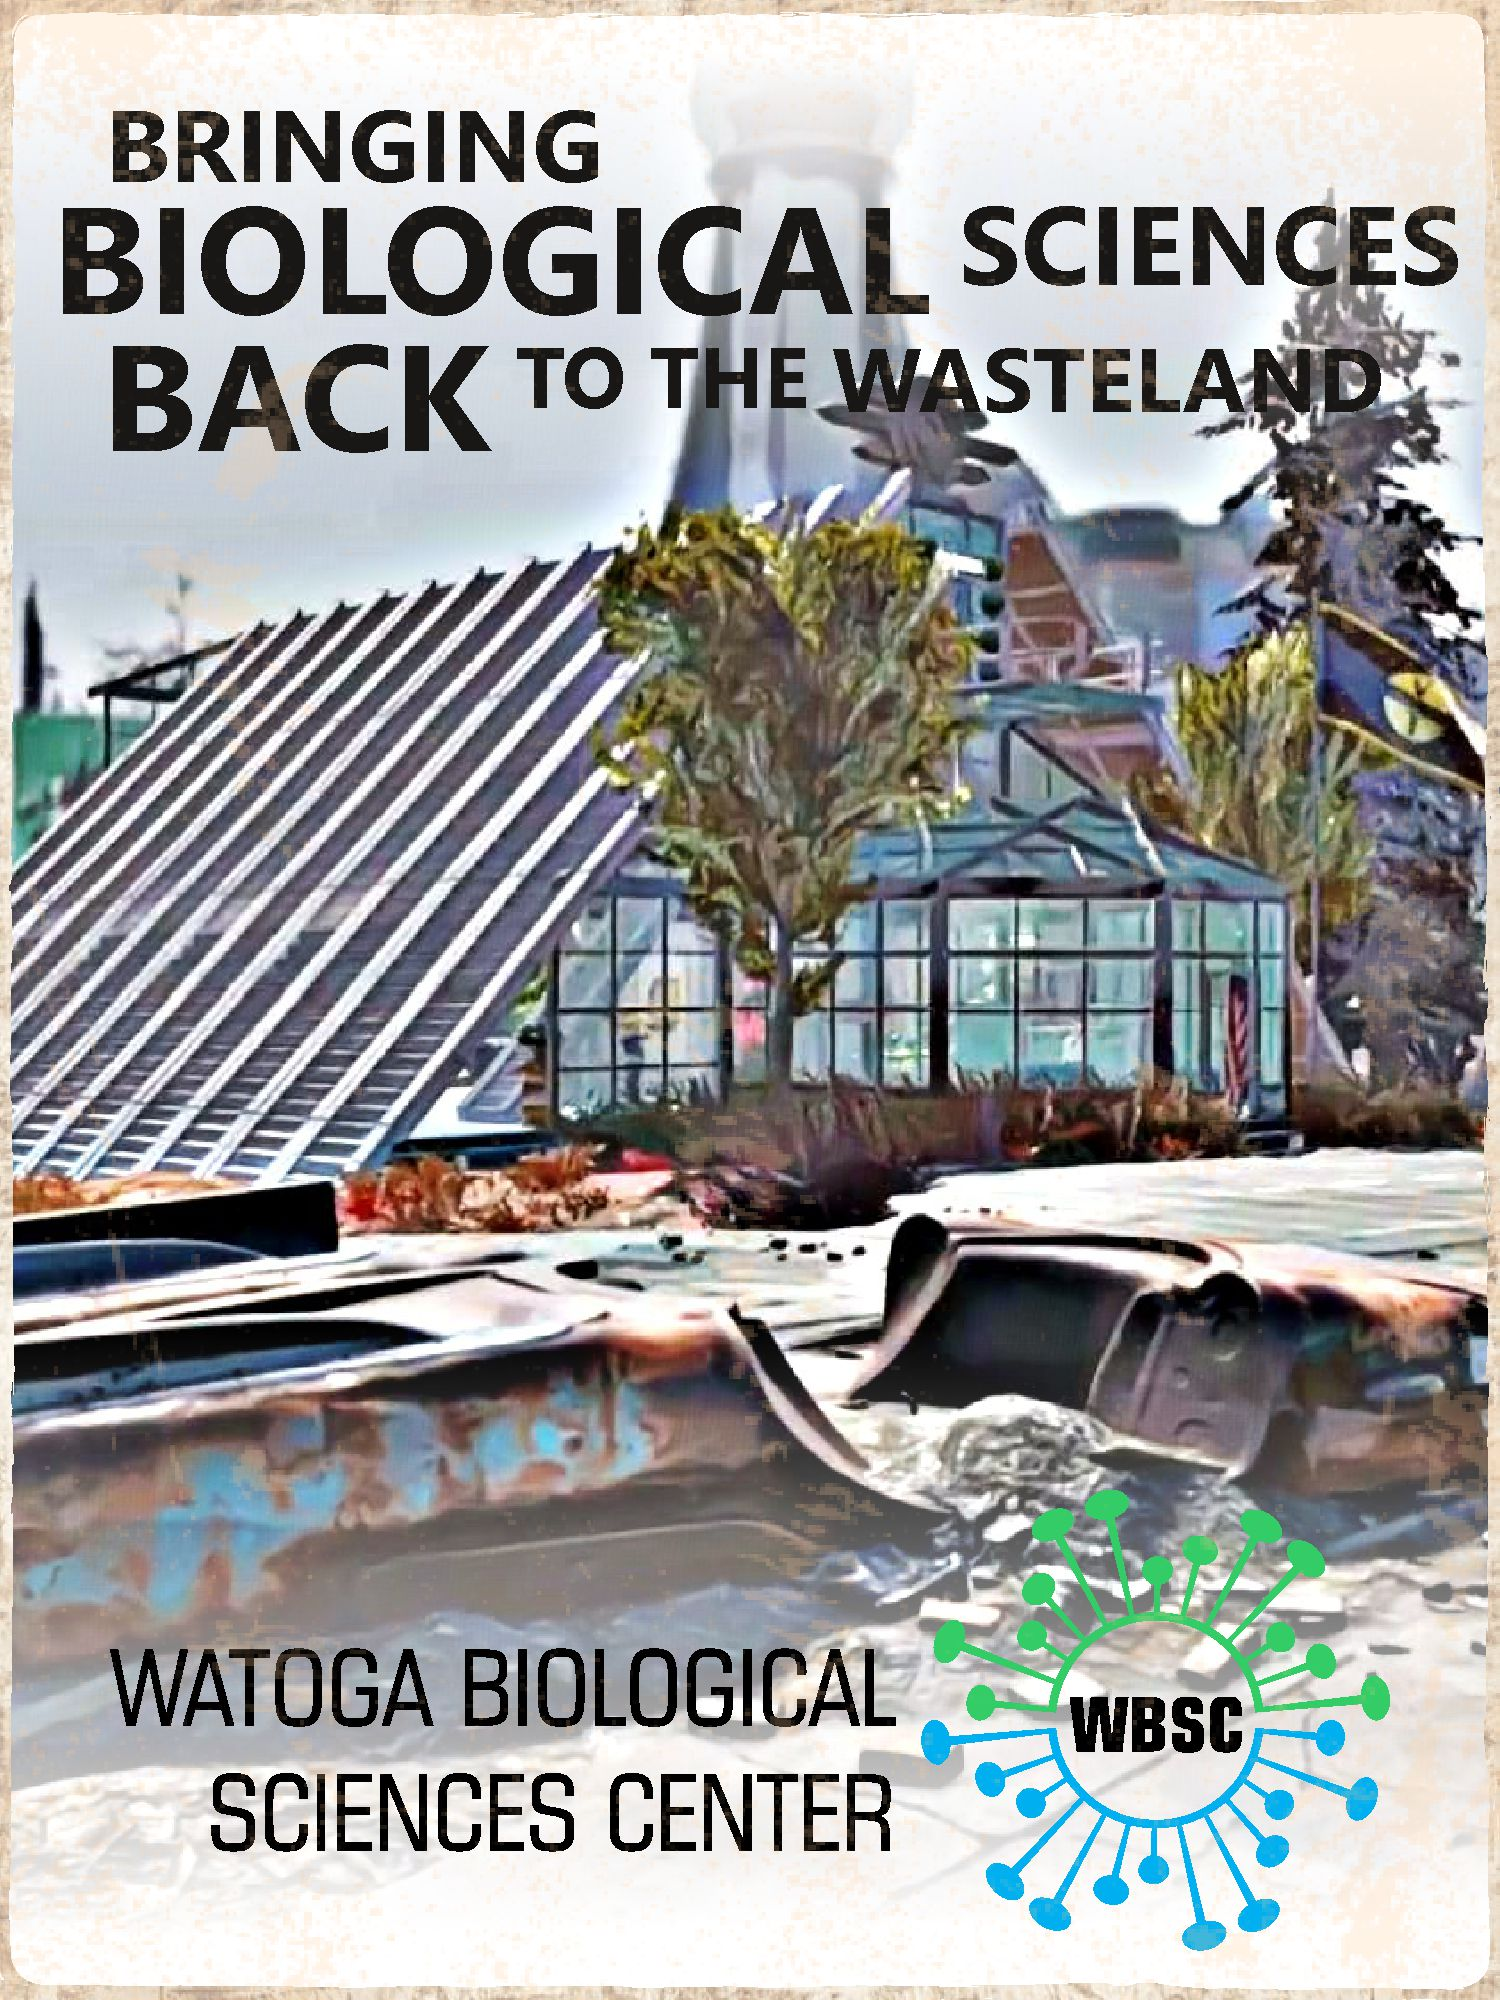 Watoga Biological Sciences Center